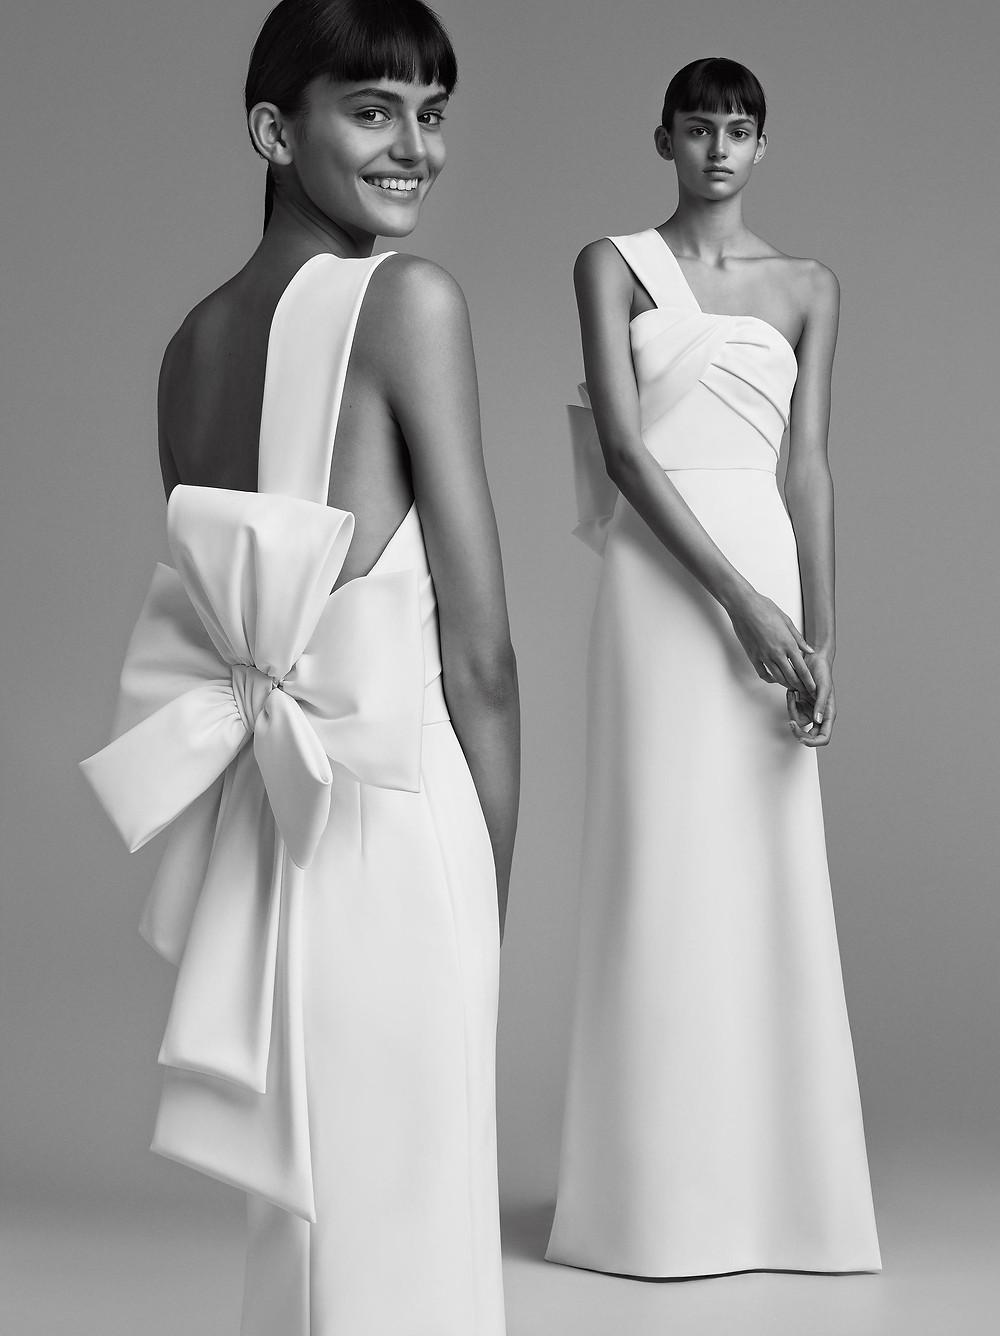 A Viktor & Rolf simple, one-shoulder sheath wedding dress, with a large bow